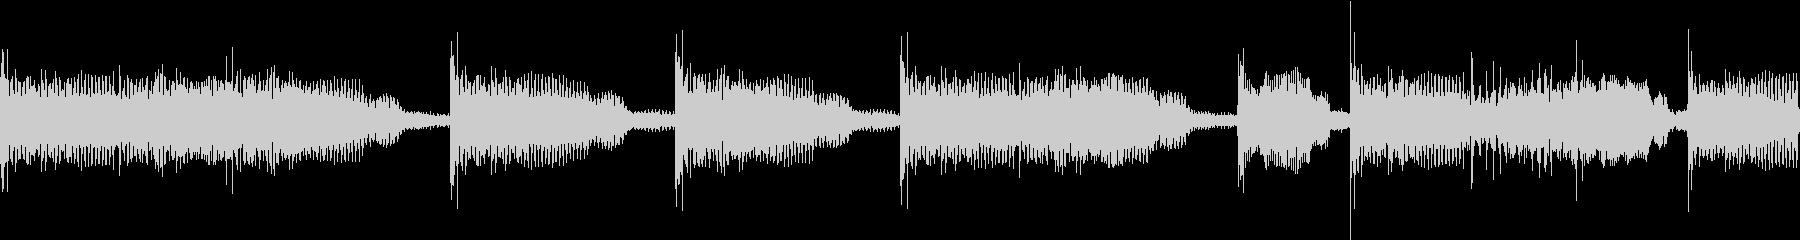 Hiphop デジタル RAP VOXの未再生の波形